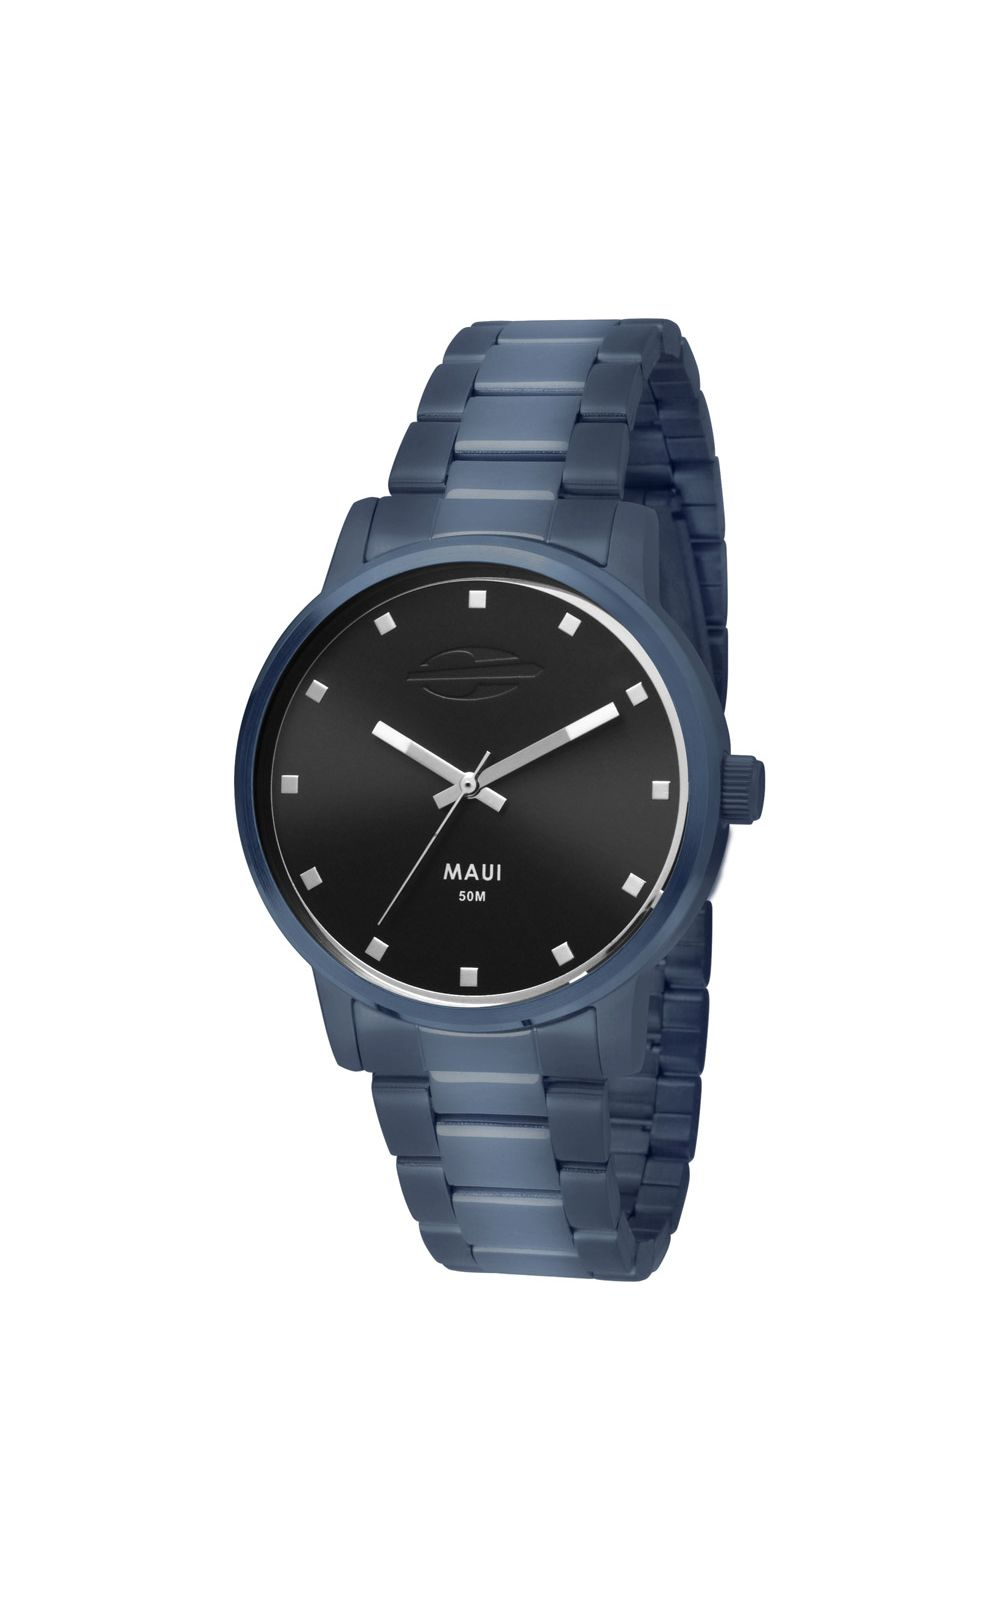 2b65db67d5545 Relógio Mormaii Feminino Maui - MO2035FS 4P. undefined